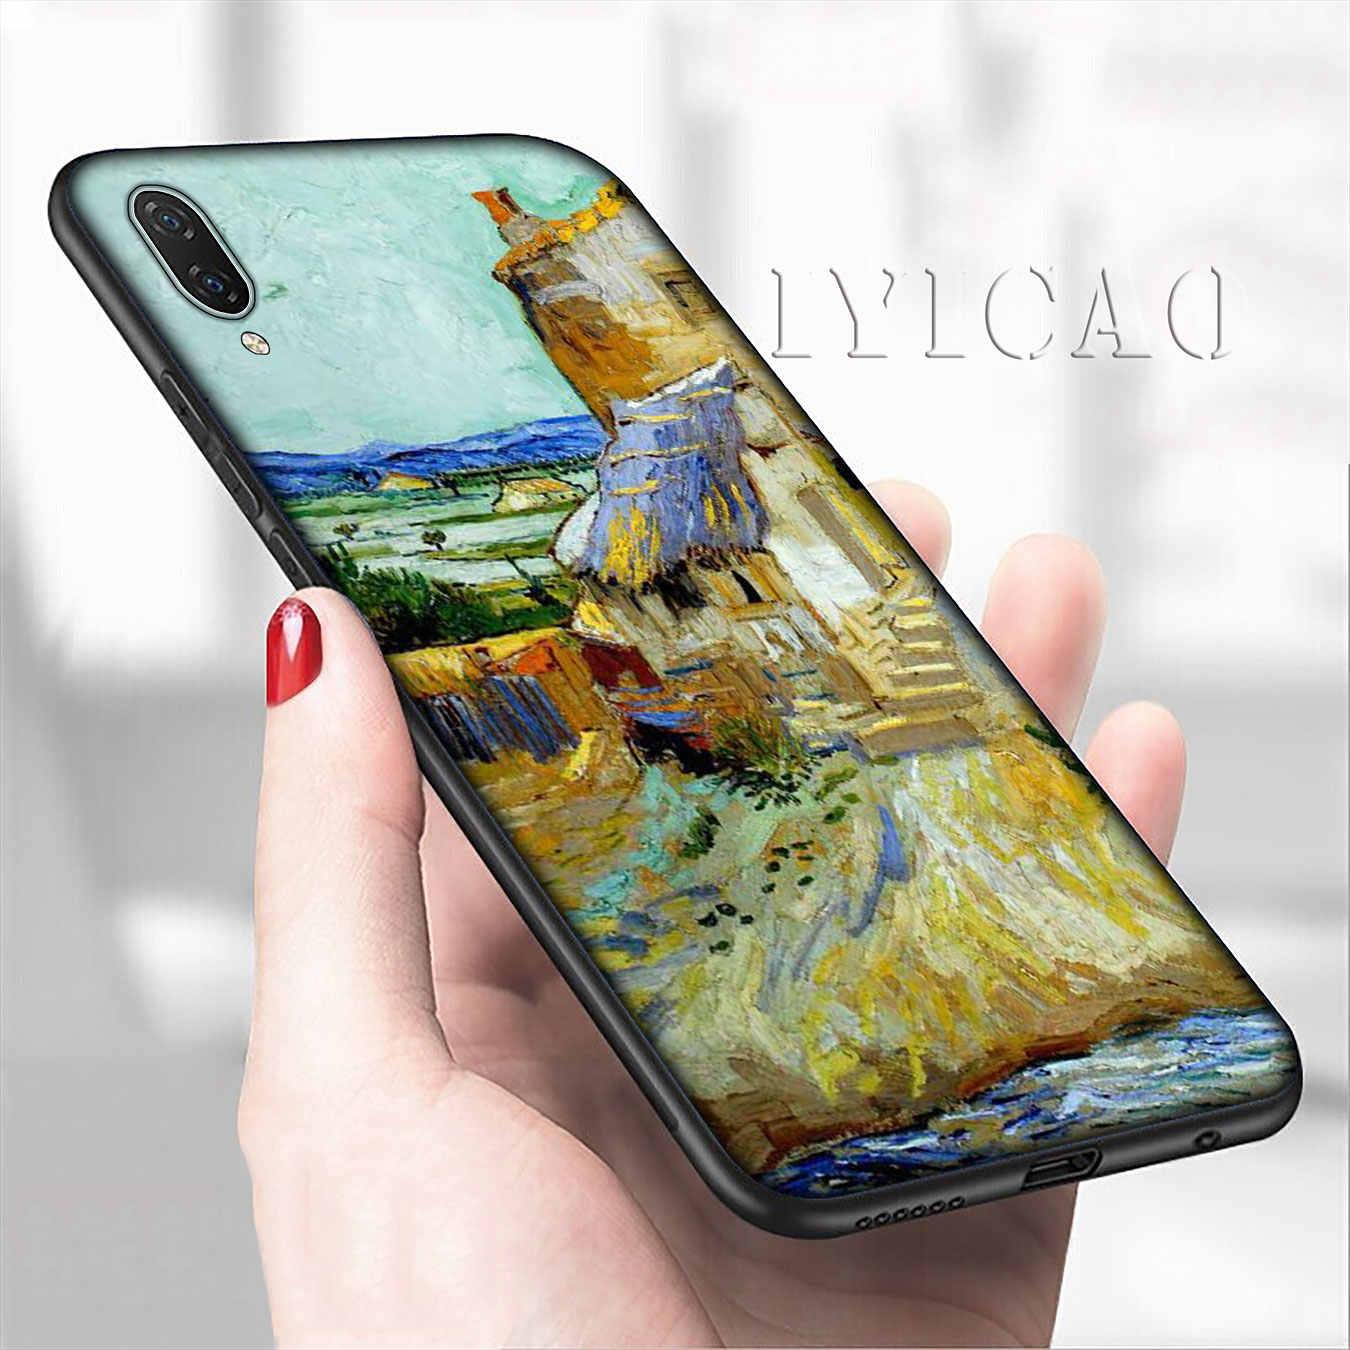 IYICAO ואן גוך אמנות ציור חמוד רך טלפון מקרה עבור שיאו mi mi 9 9T A3 פרו CC9 CC9E 8 A2 לייט A1 6 6X 5X f1 מקסימום 3 mi 9 mi 8